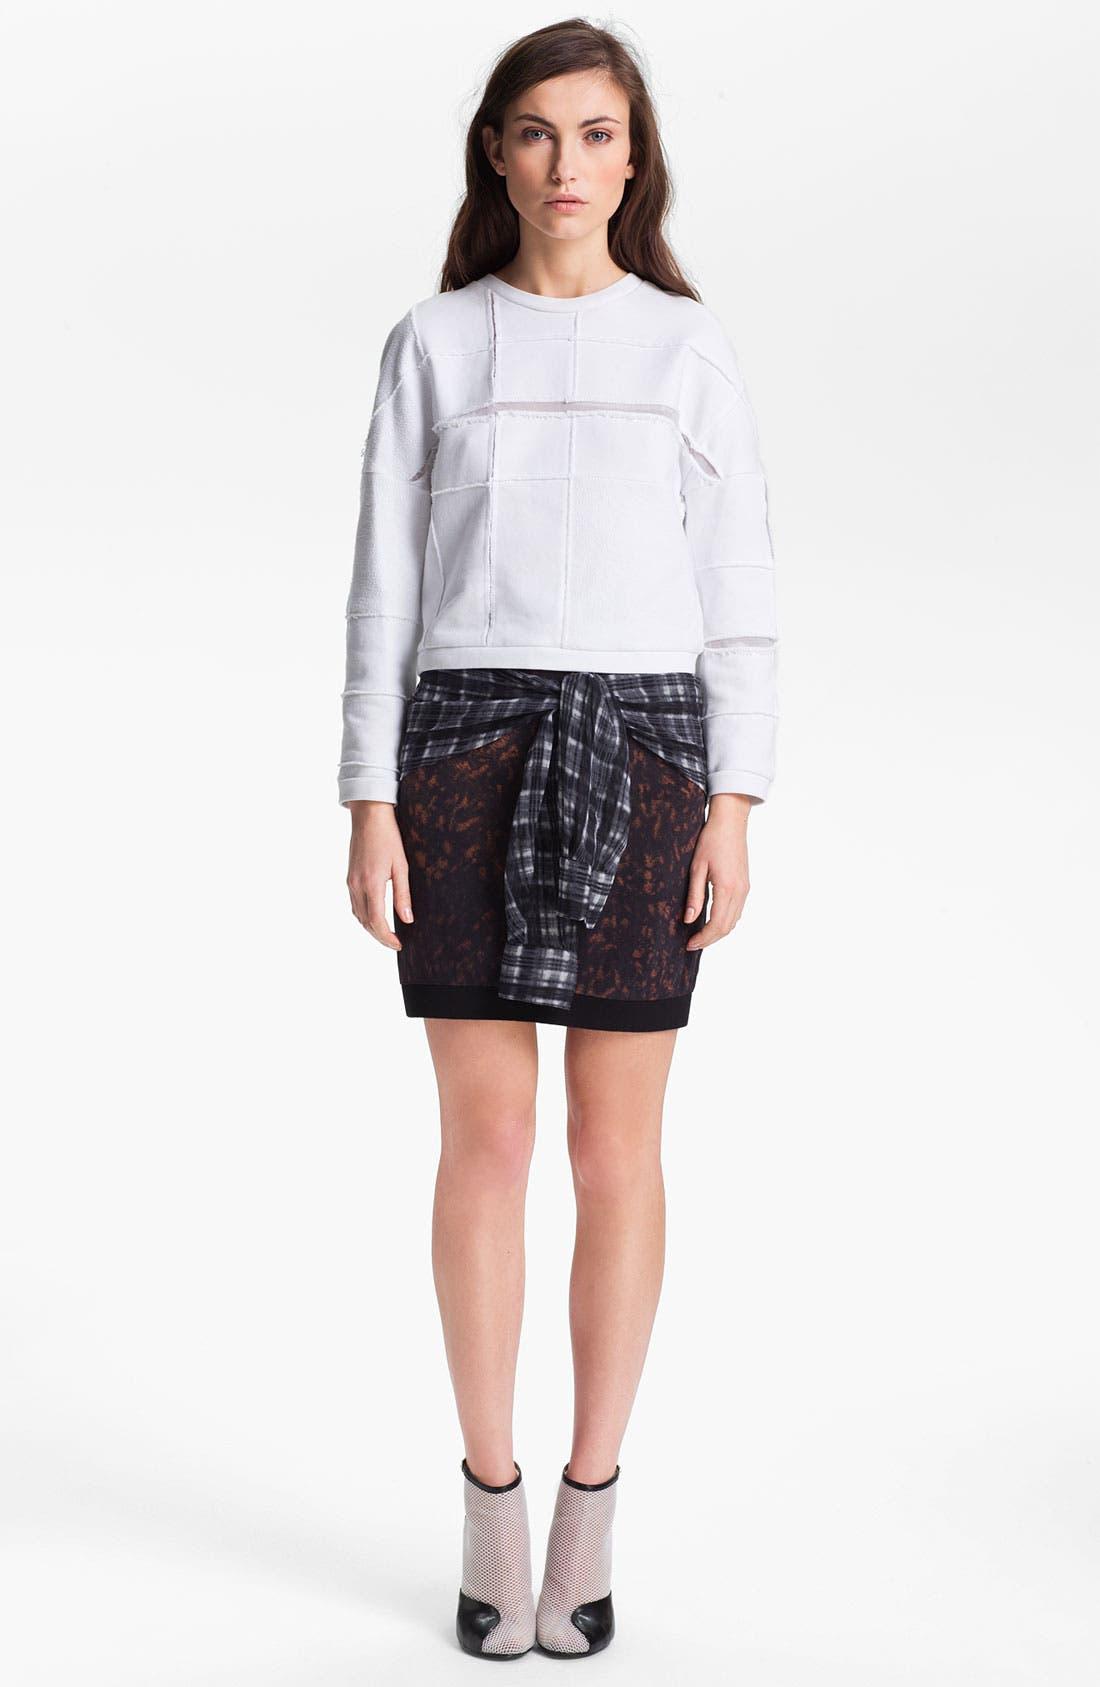 Main Image - 3.1 Phillip Lim 'Cut Up' Plaid Sweatshirt